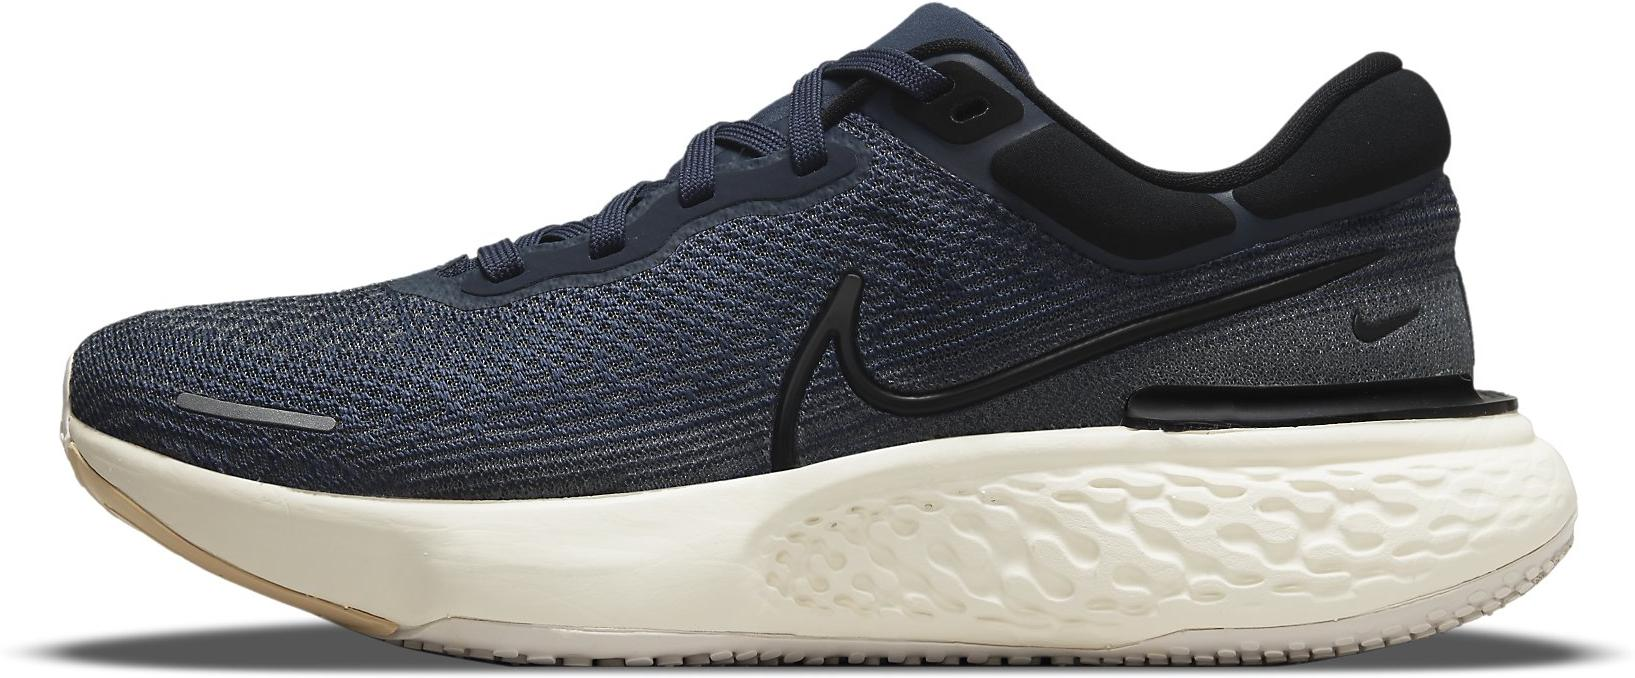 Zapatillas de running Nike ZoomX Invincible Run Flyknit Men s Running Shoe